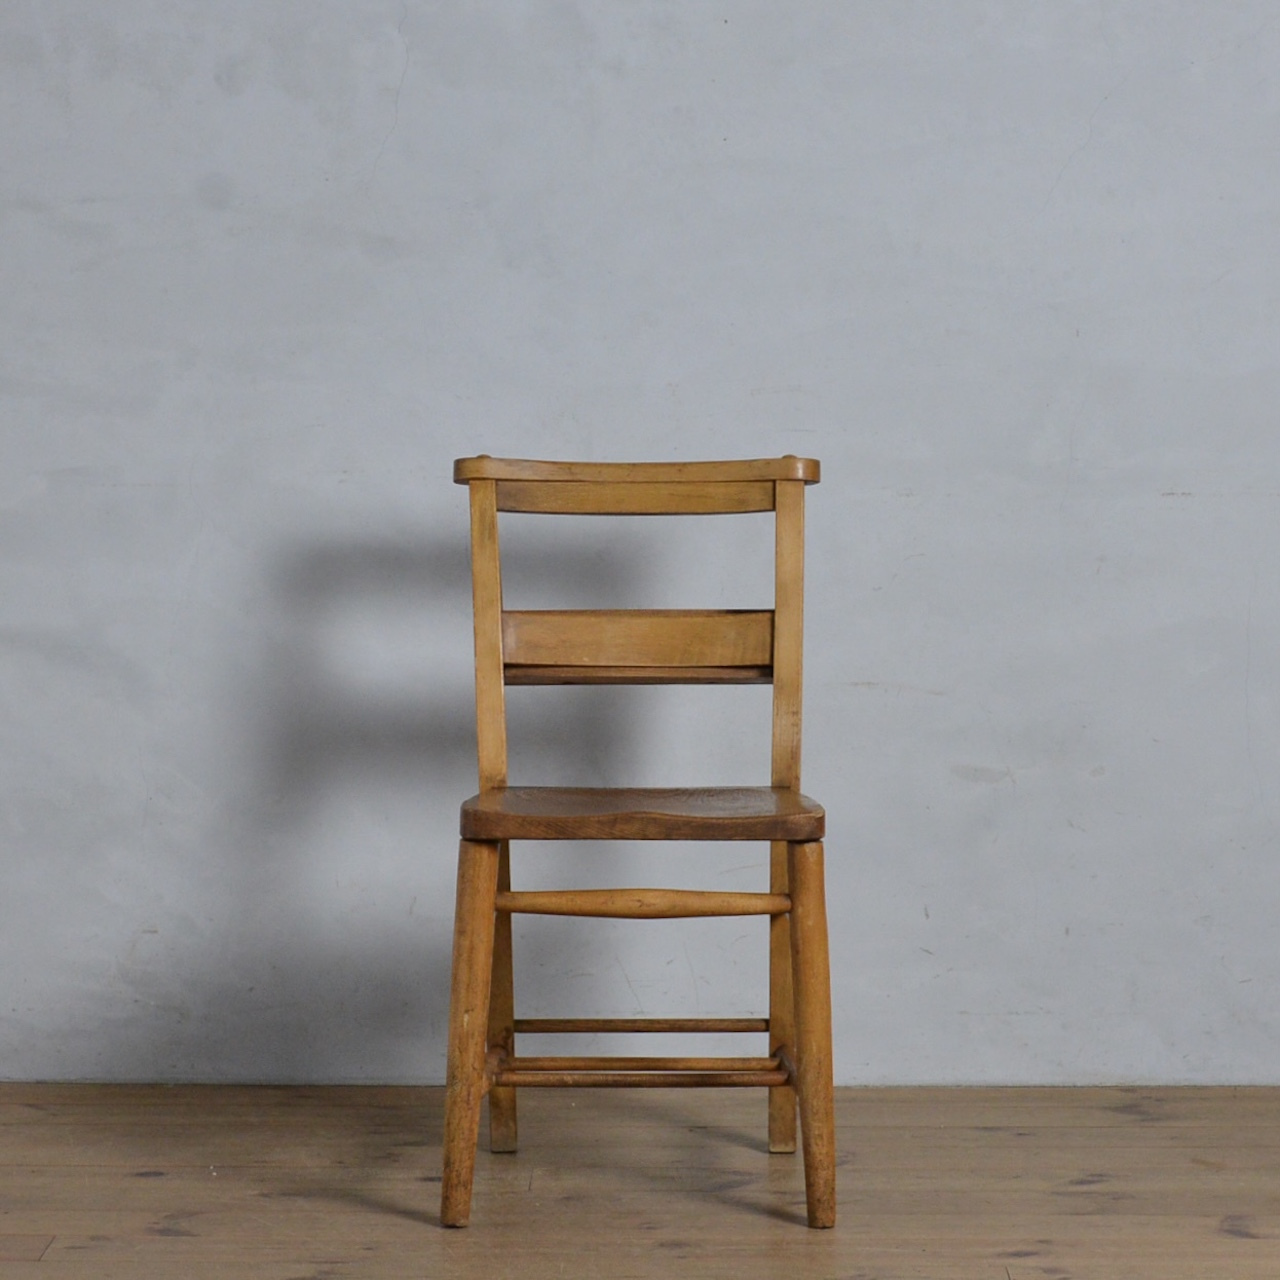 Church Chair / チャーチチェア 【A】〈チャペルチェア・ダイニングチェア・デスクチェア・椅子〉112177